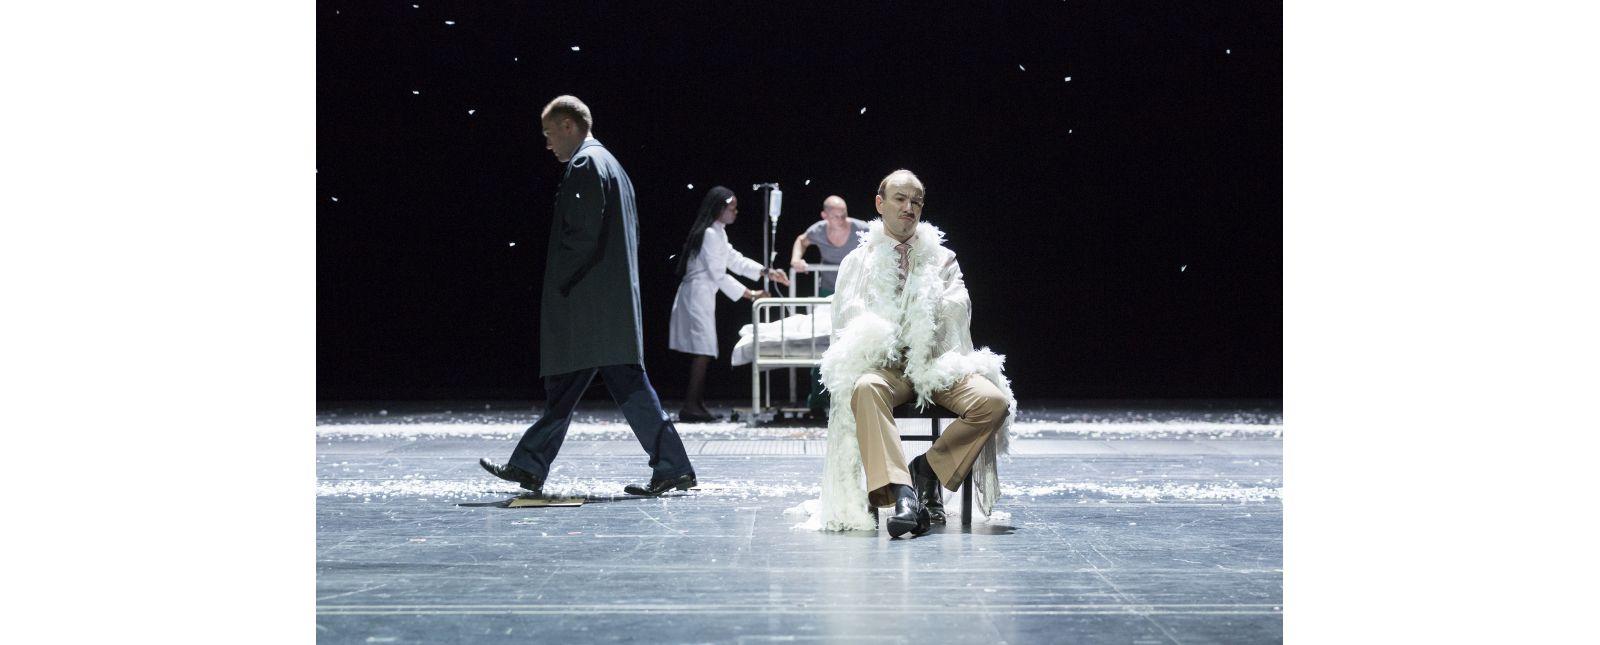 Angels in America // John Carpenter, Henry Motra, Bernhard Landauer, Andreas Jankowitsch  // 2018 // Rainer Muranyi